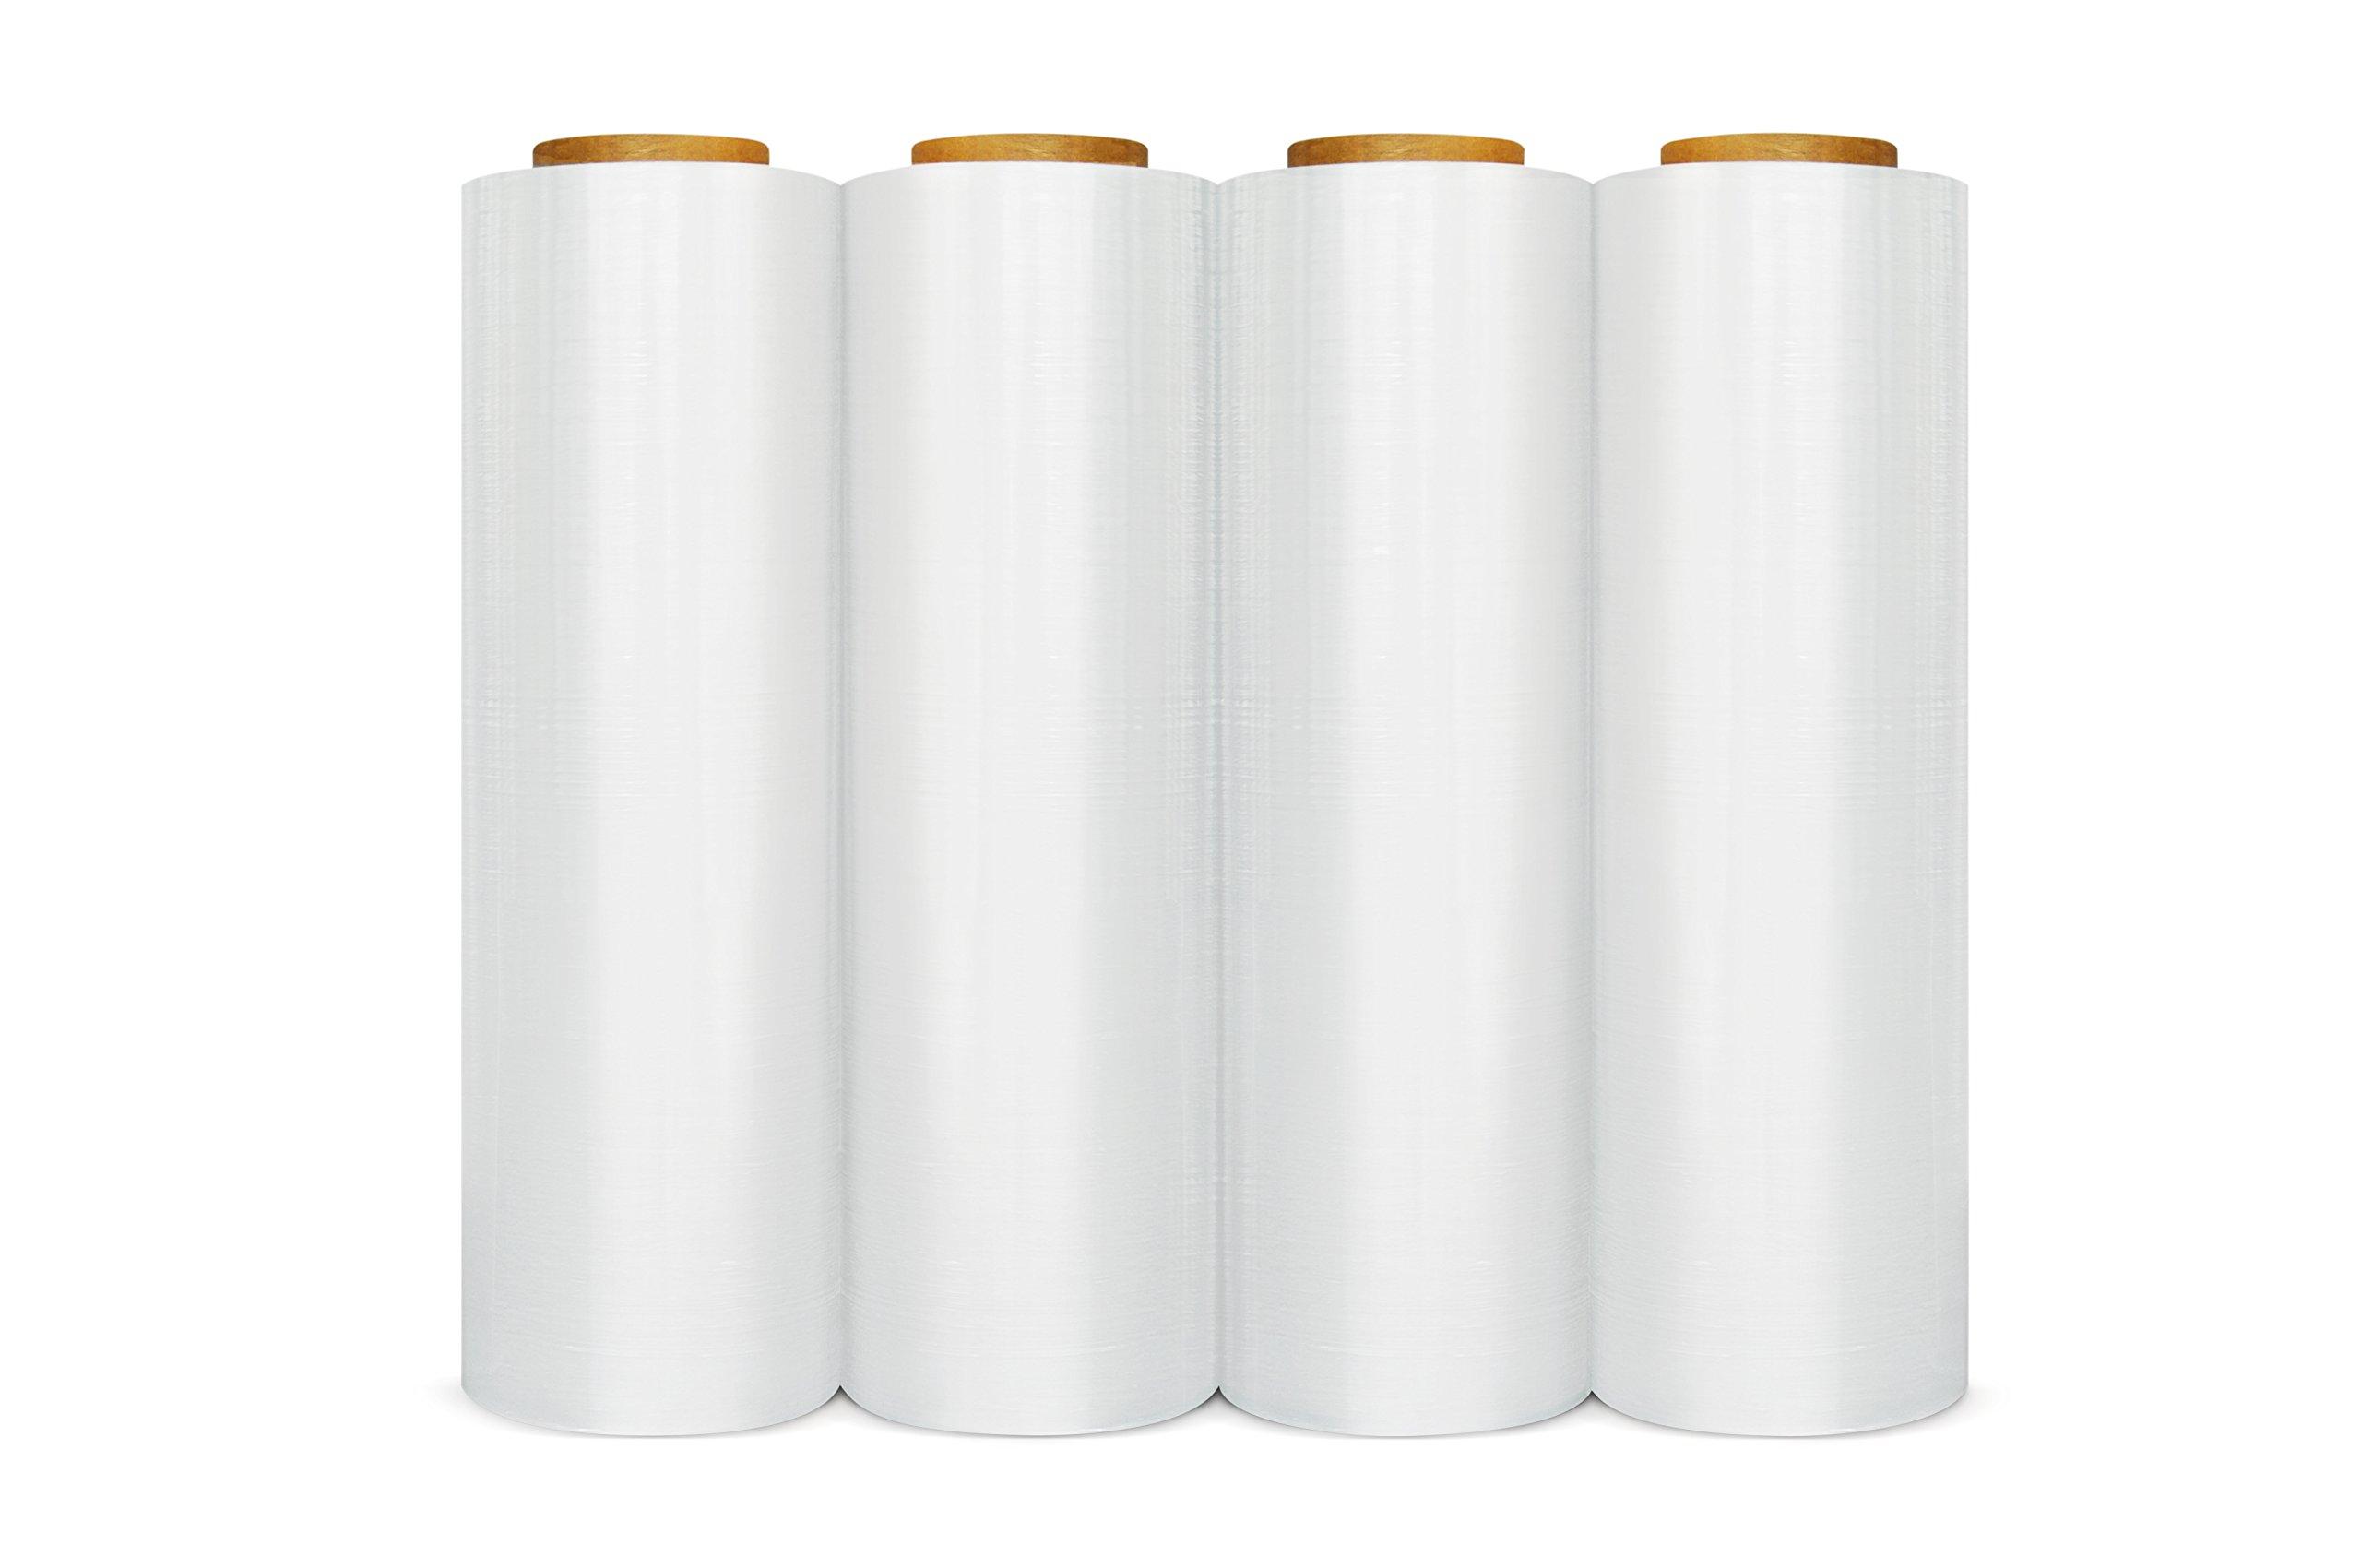 Stretch Film Wrap, Heavy Duty Shrink Wrap Roll, Clear, 18 Inch x 1500 Feet, 90 Gauge, 4 Pack by PackagingSuppliesByMail